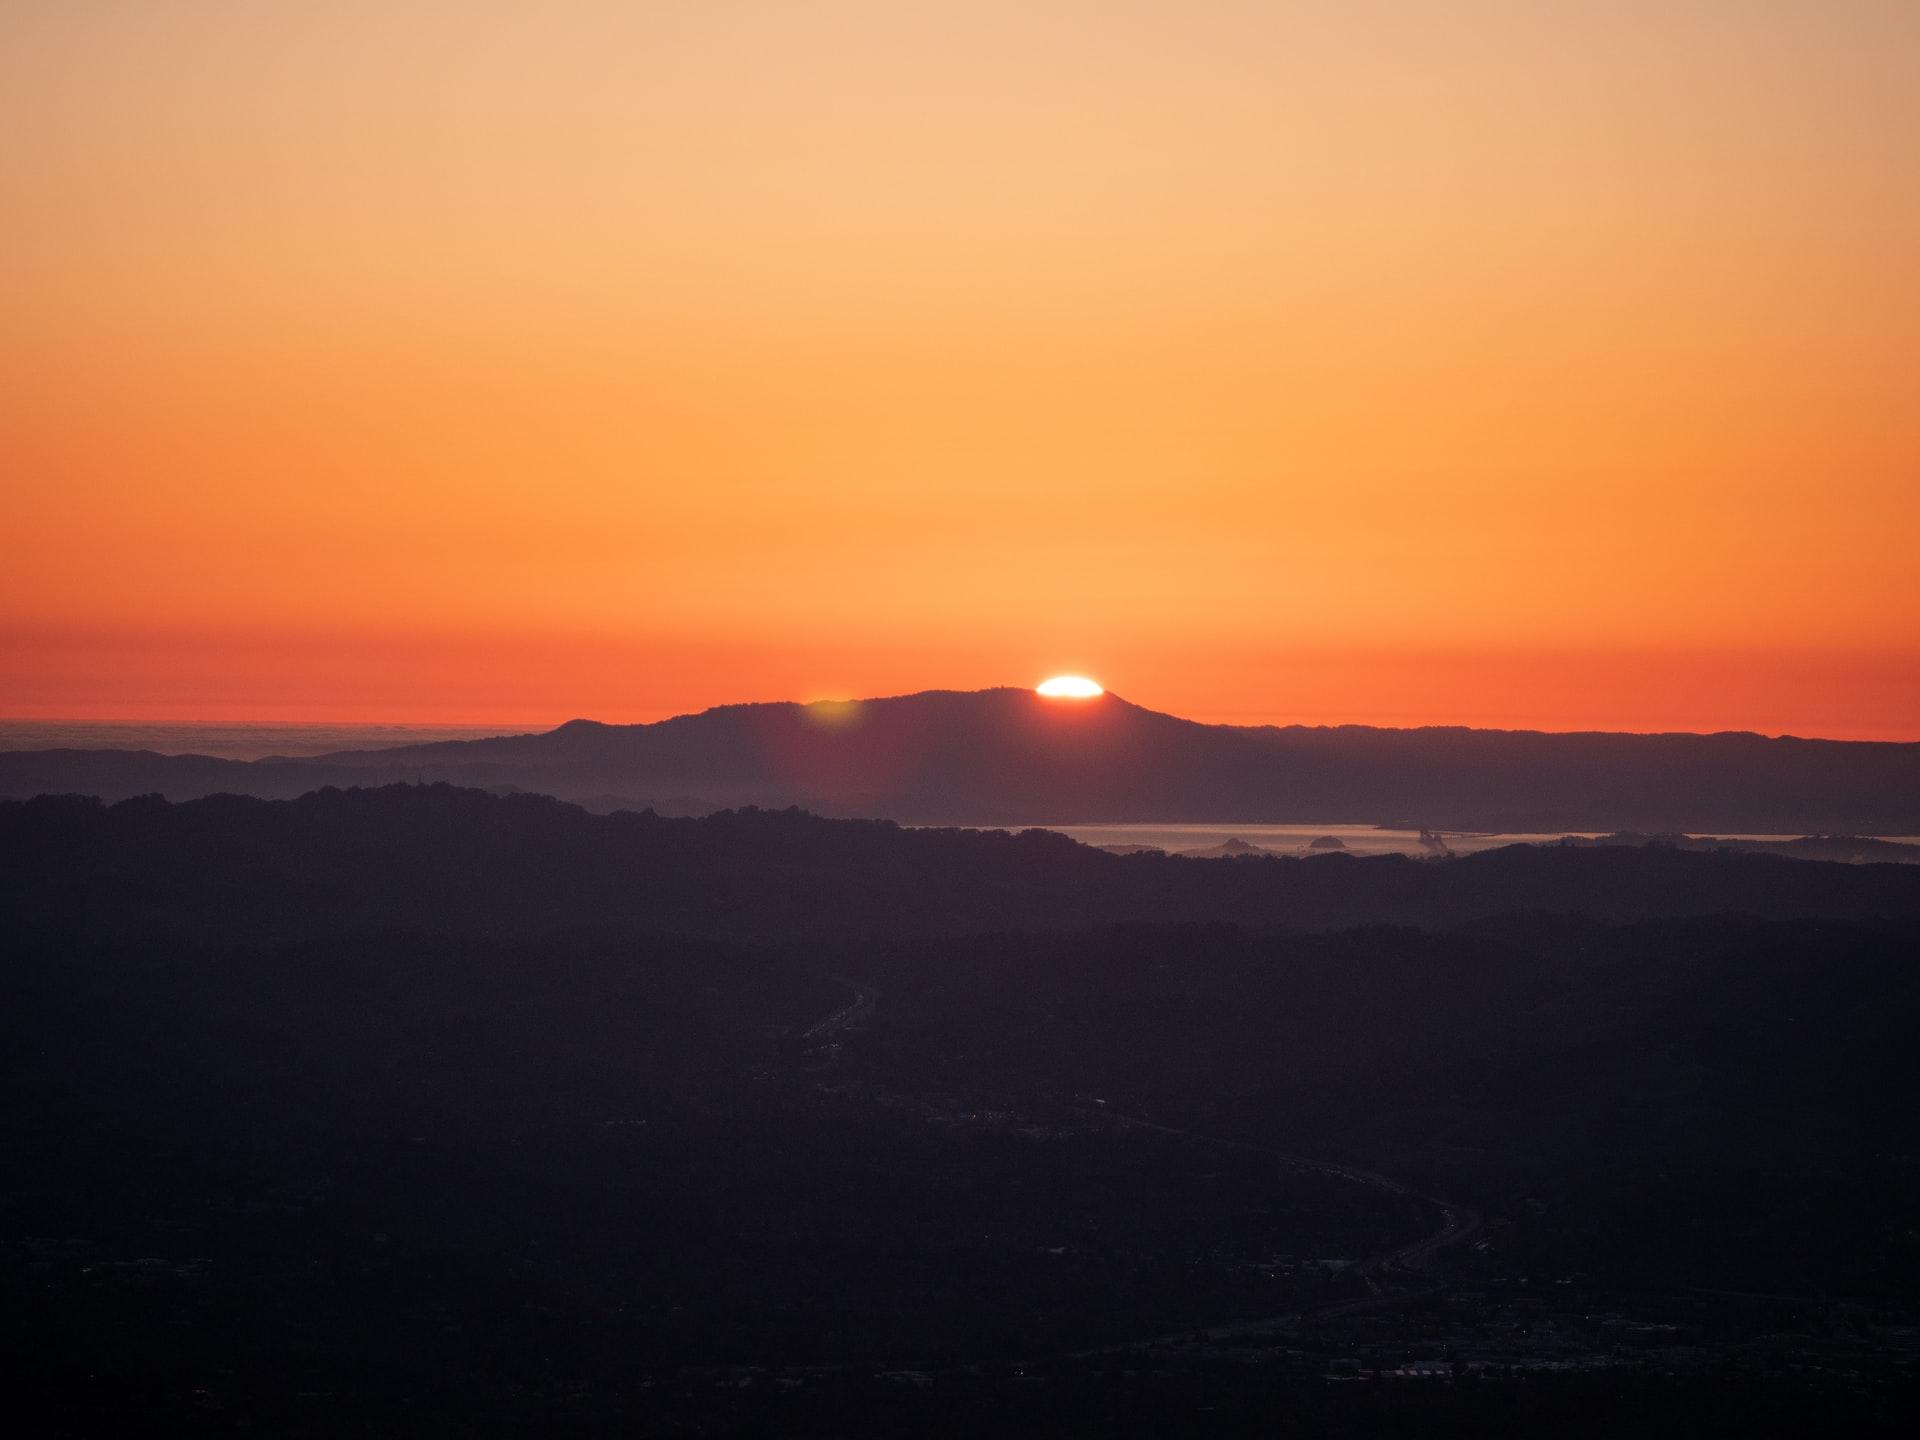 Sun set over mount Tam